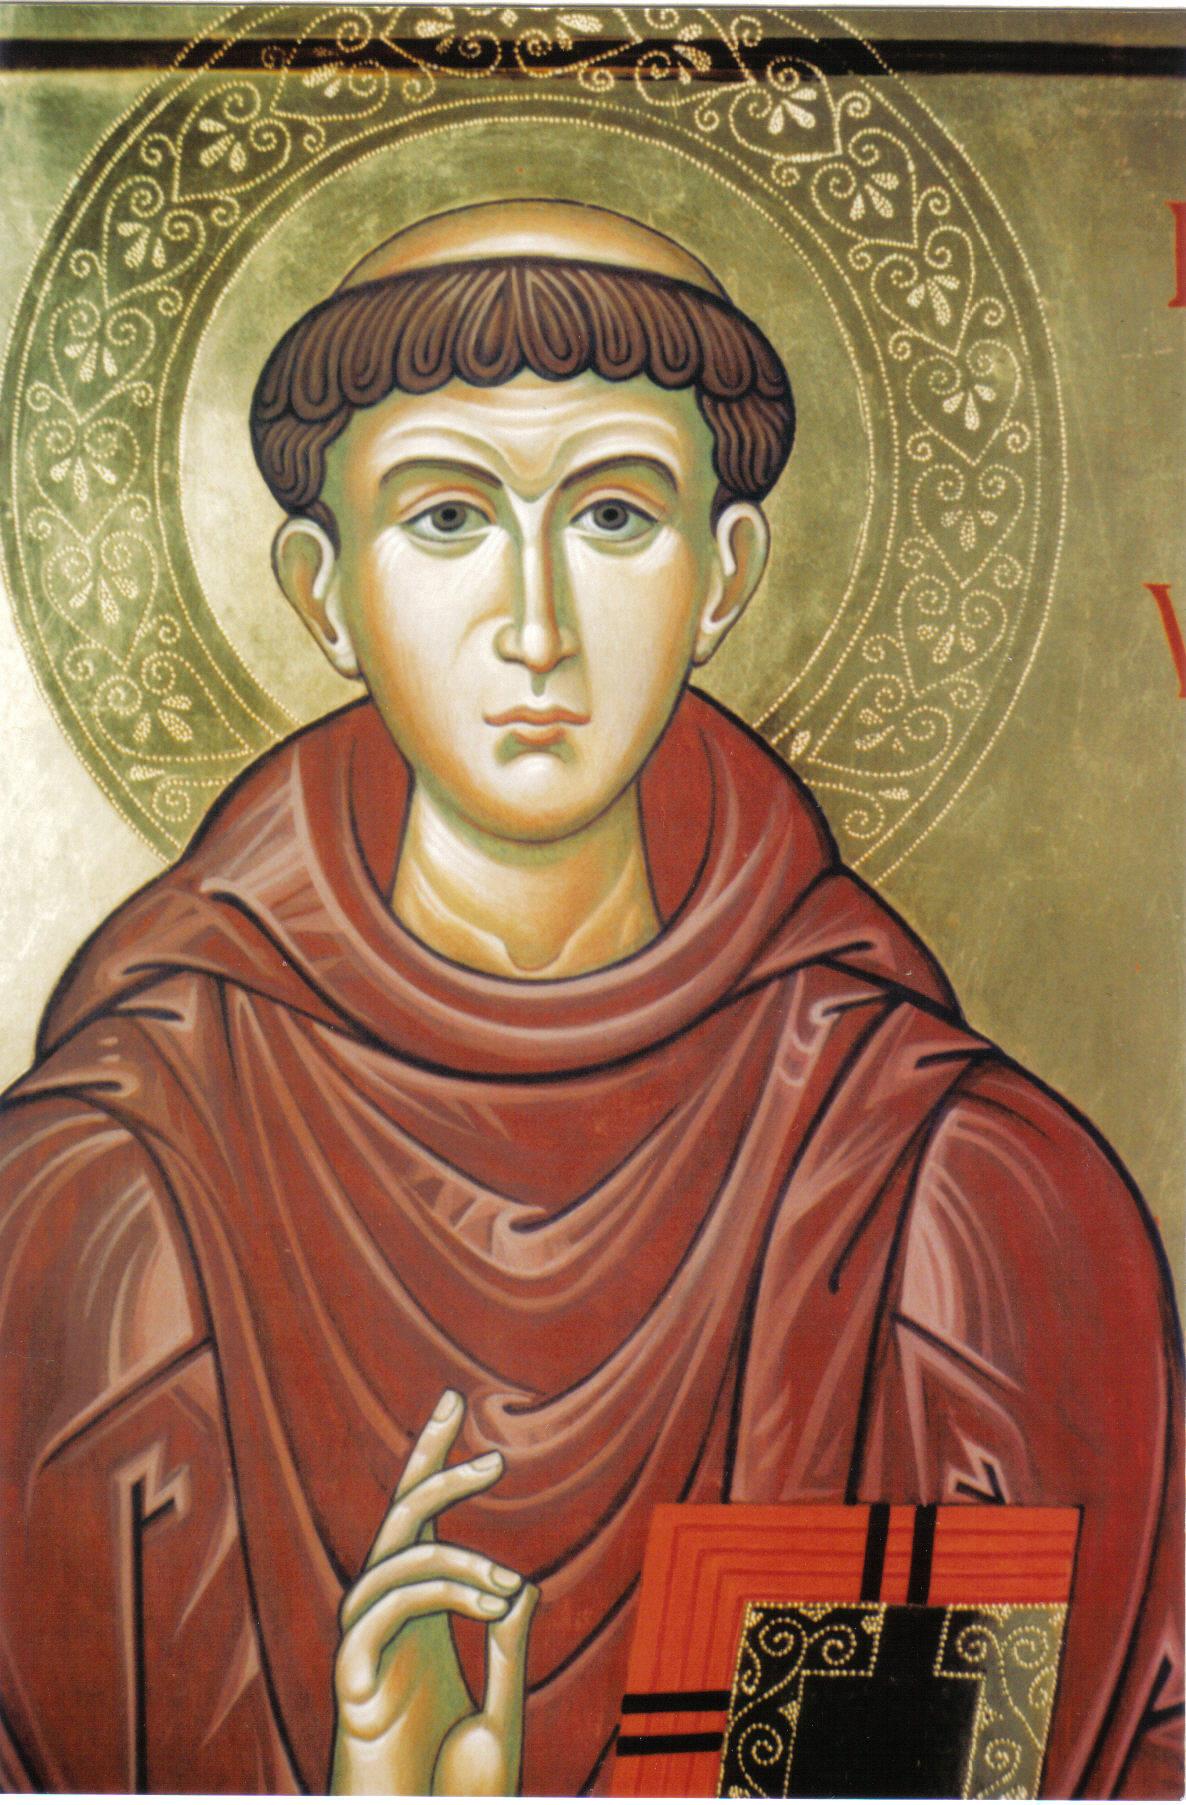 St antony of padua tom perna for The franciscan